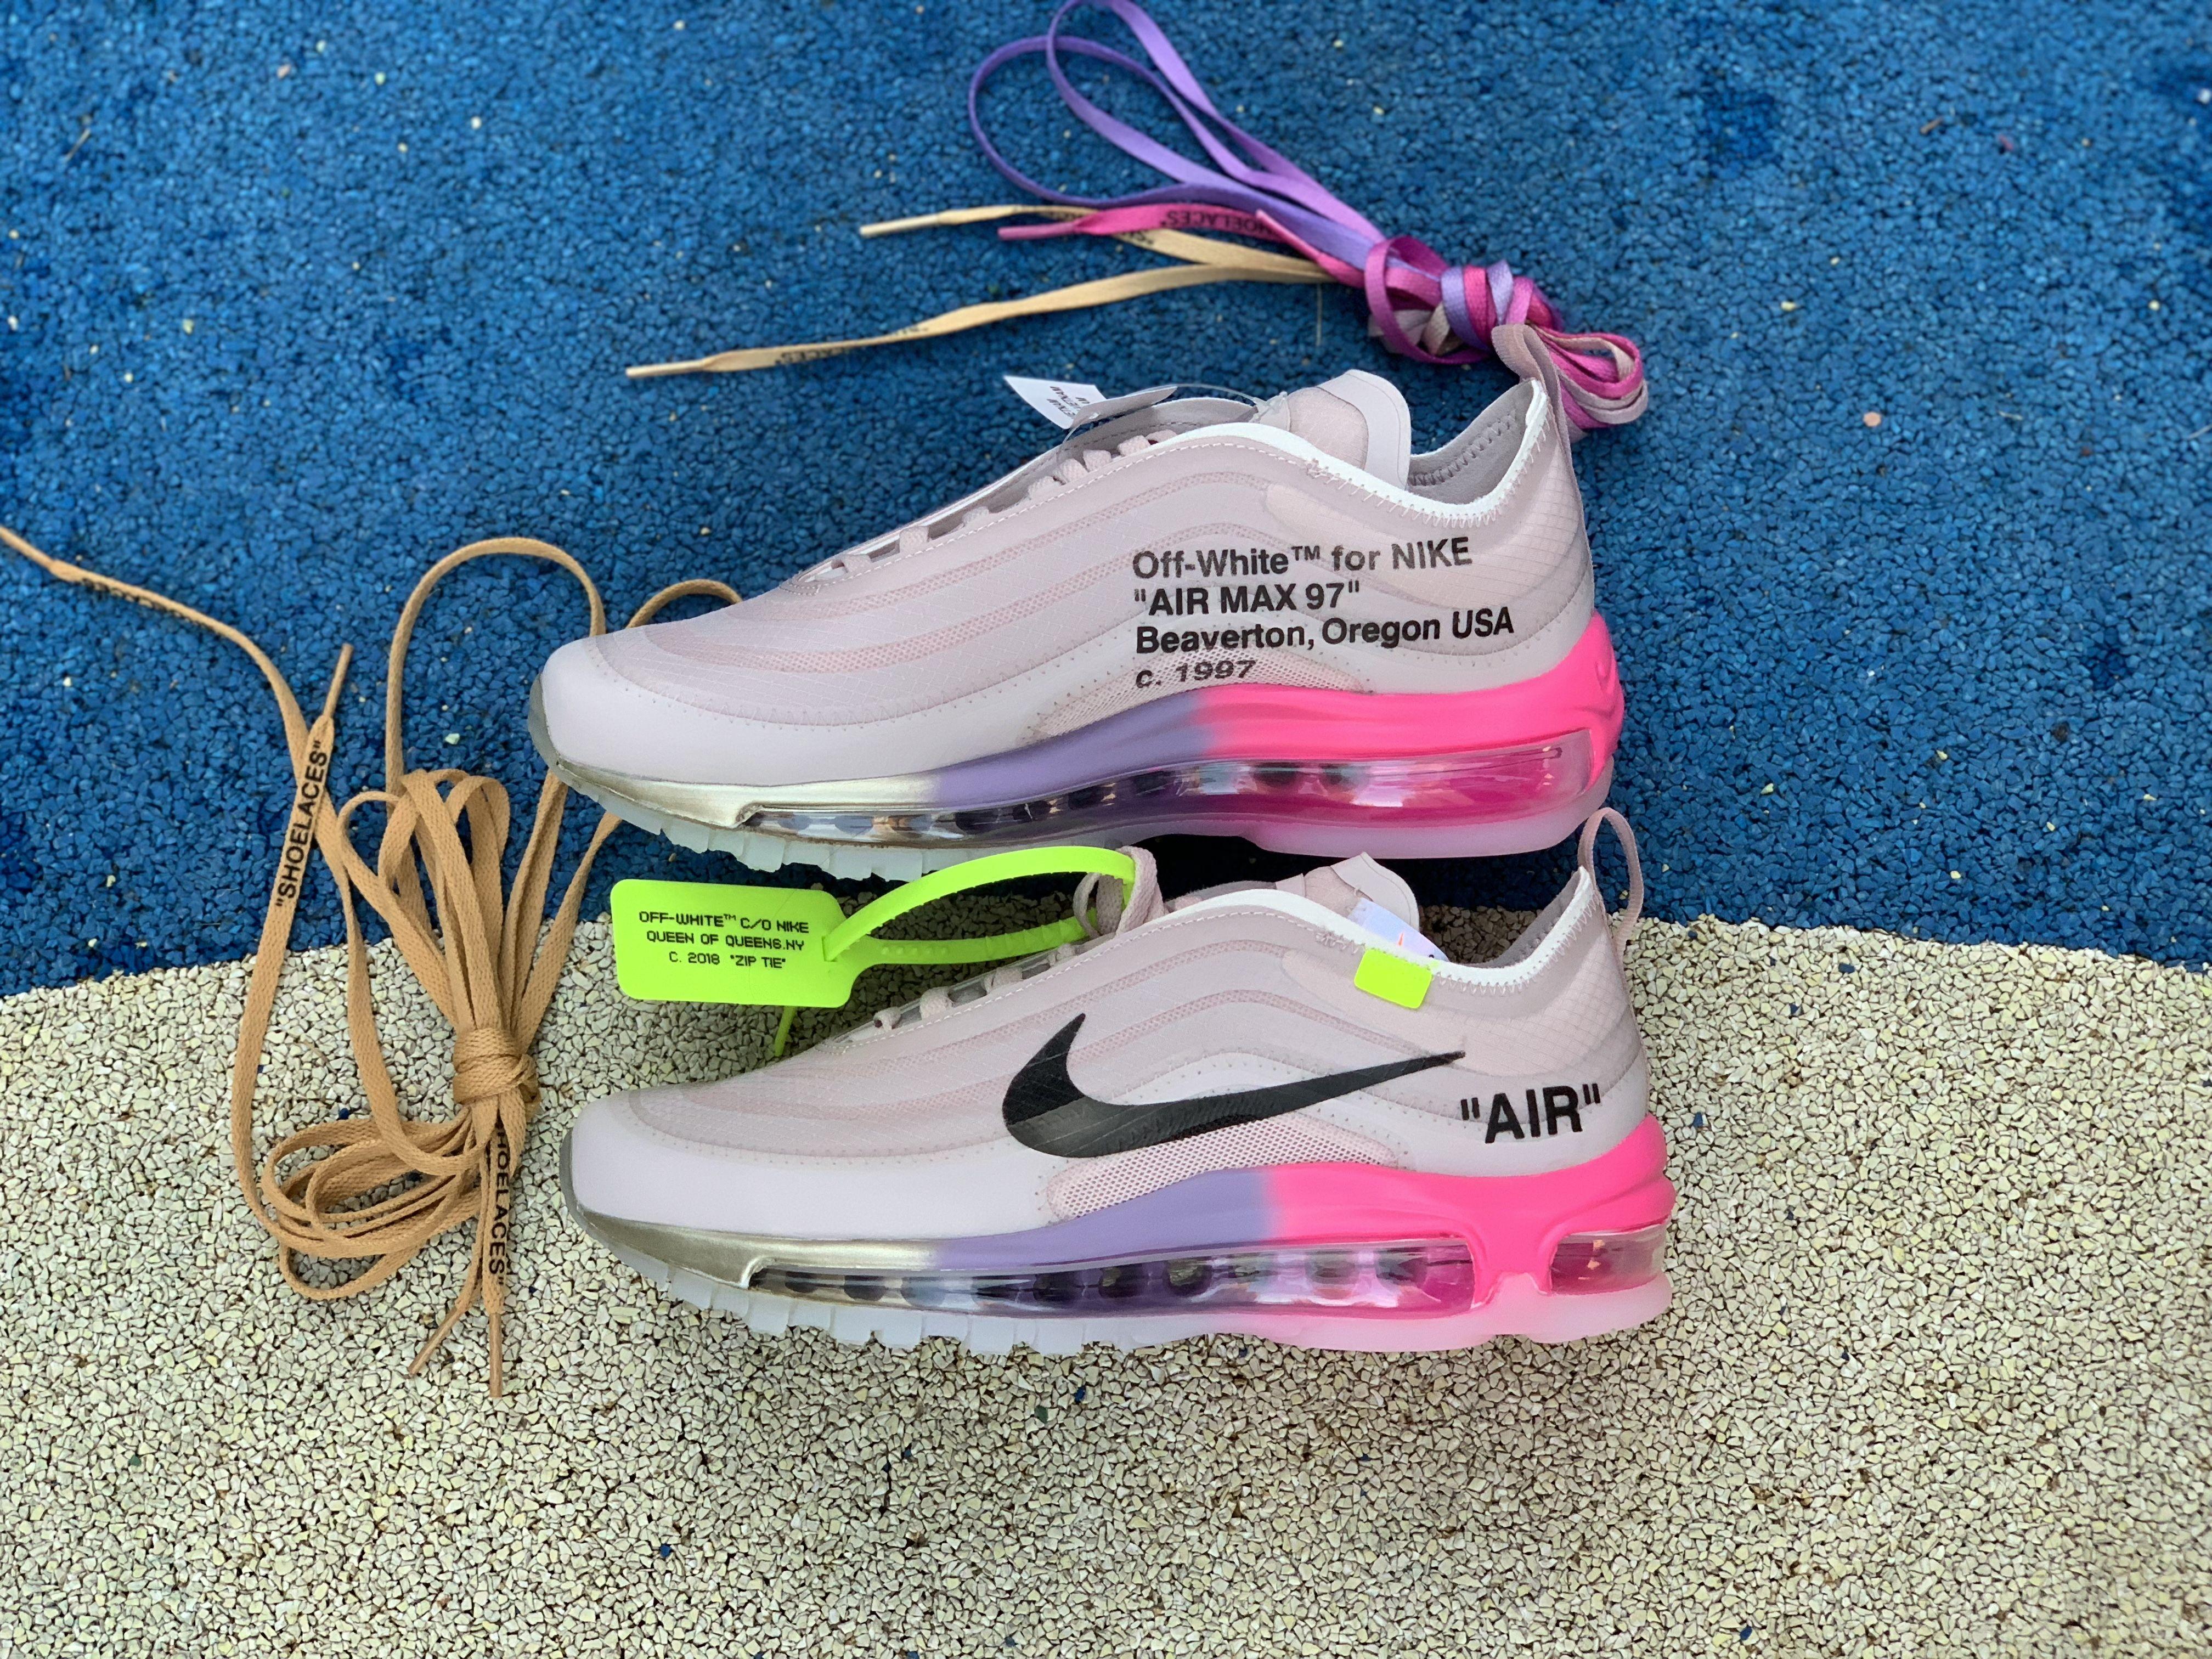 Banyan Plausibile pulire  Buy Off-White x Air Max 97 Serena Williams Queen Elemental Rose AJ4585-600  | Nike air max 97, Air max, Air max 97